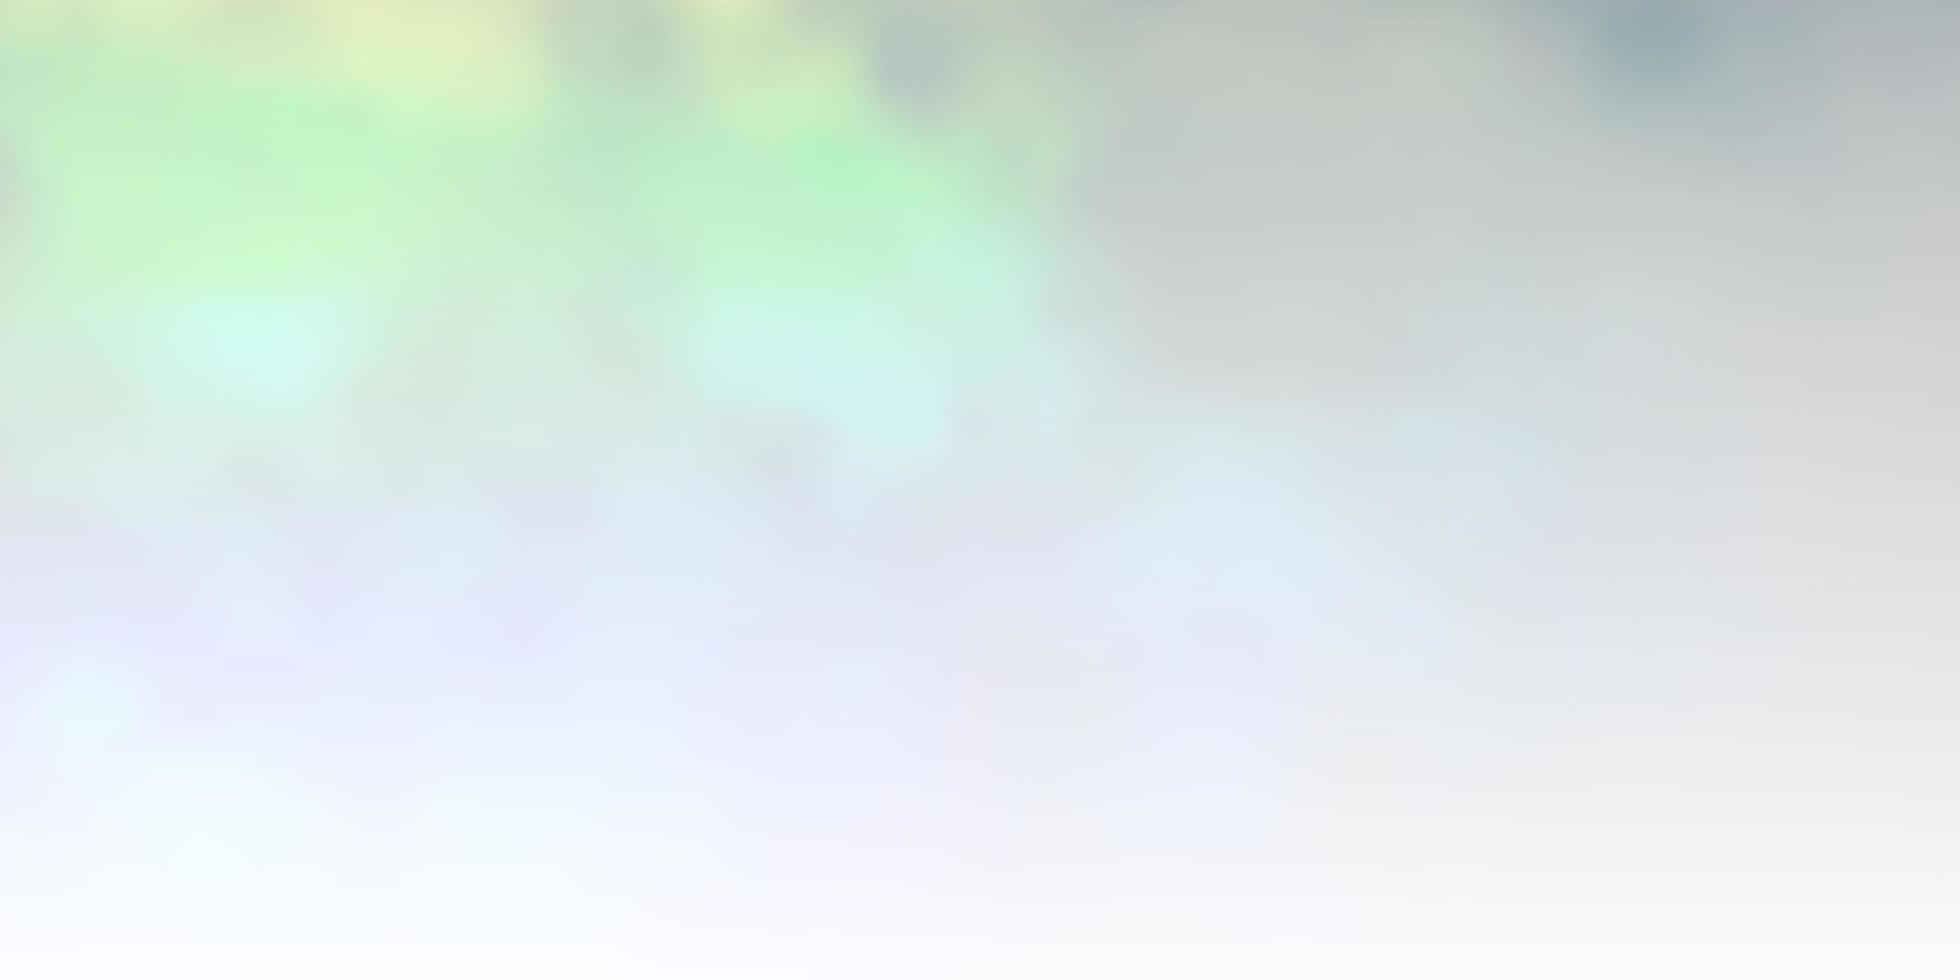 dunkle mehrfarbige Textur mit bewölktem Himmel. vektor